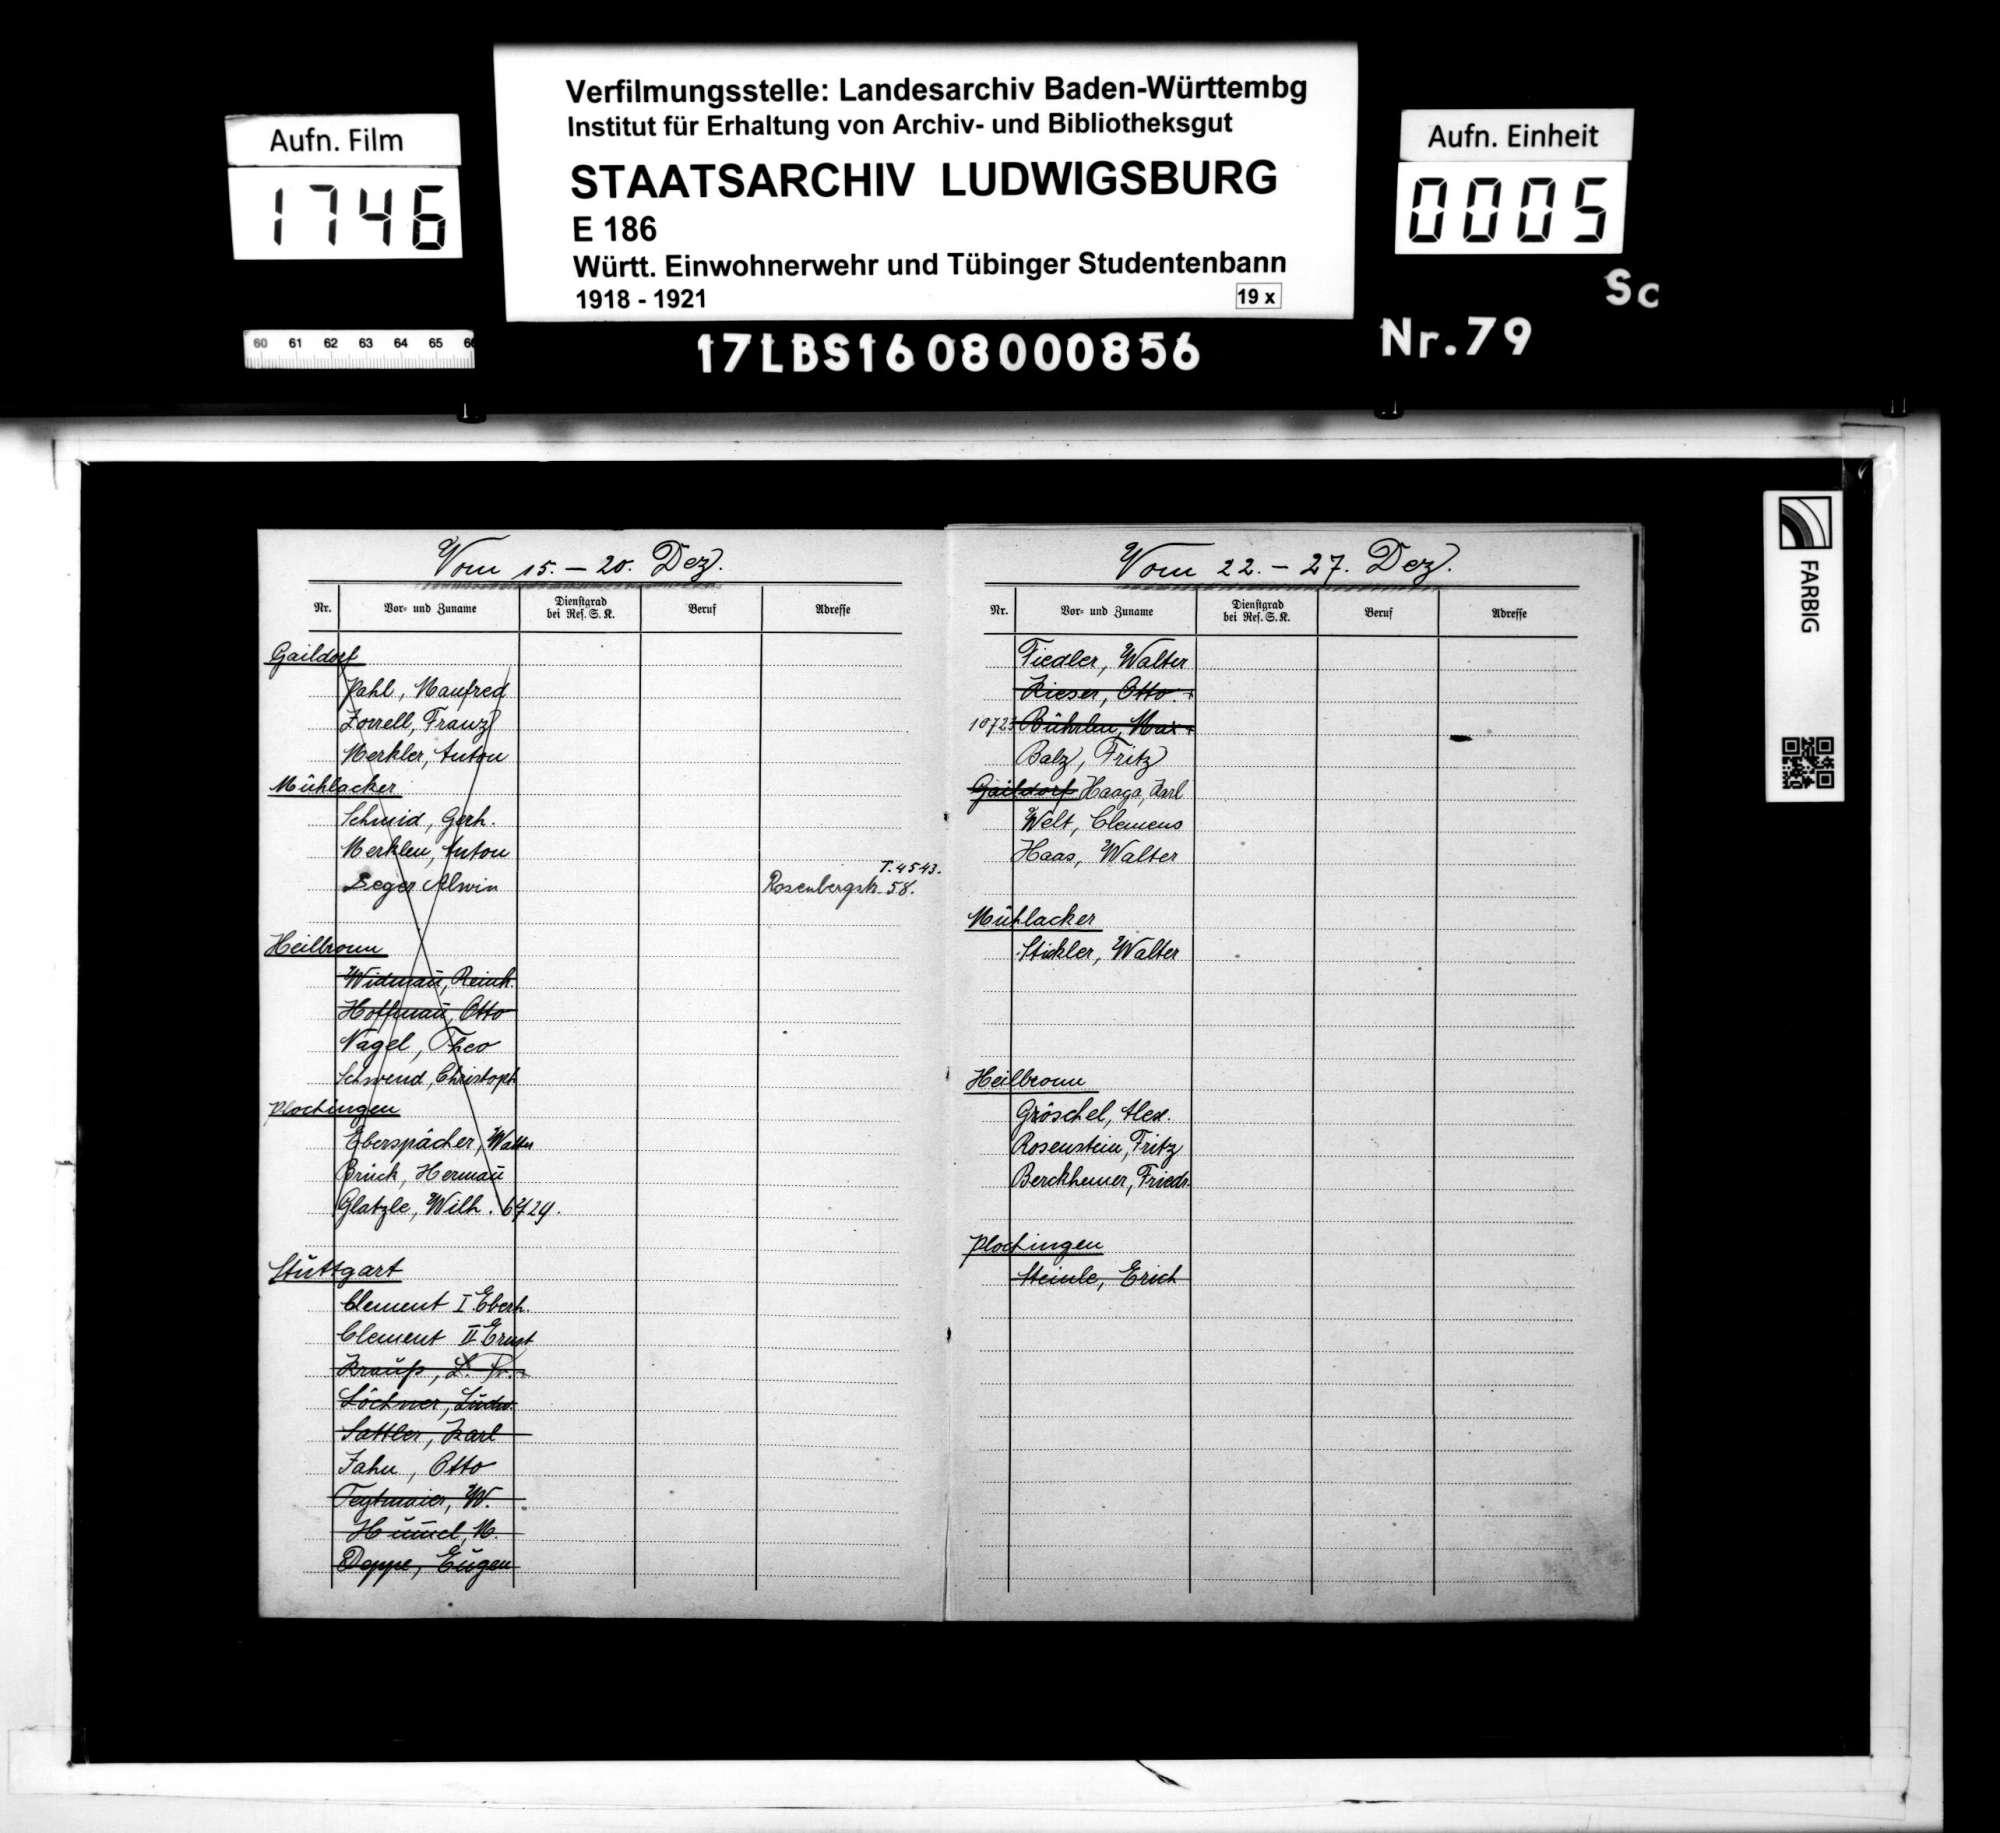 Sonderkommando Anmeldung, Bild 3